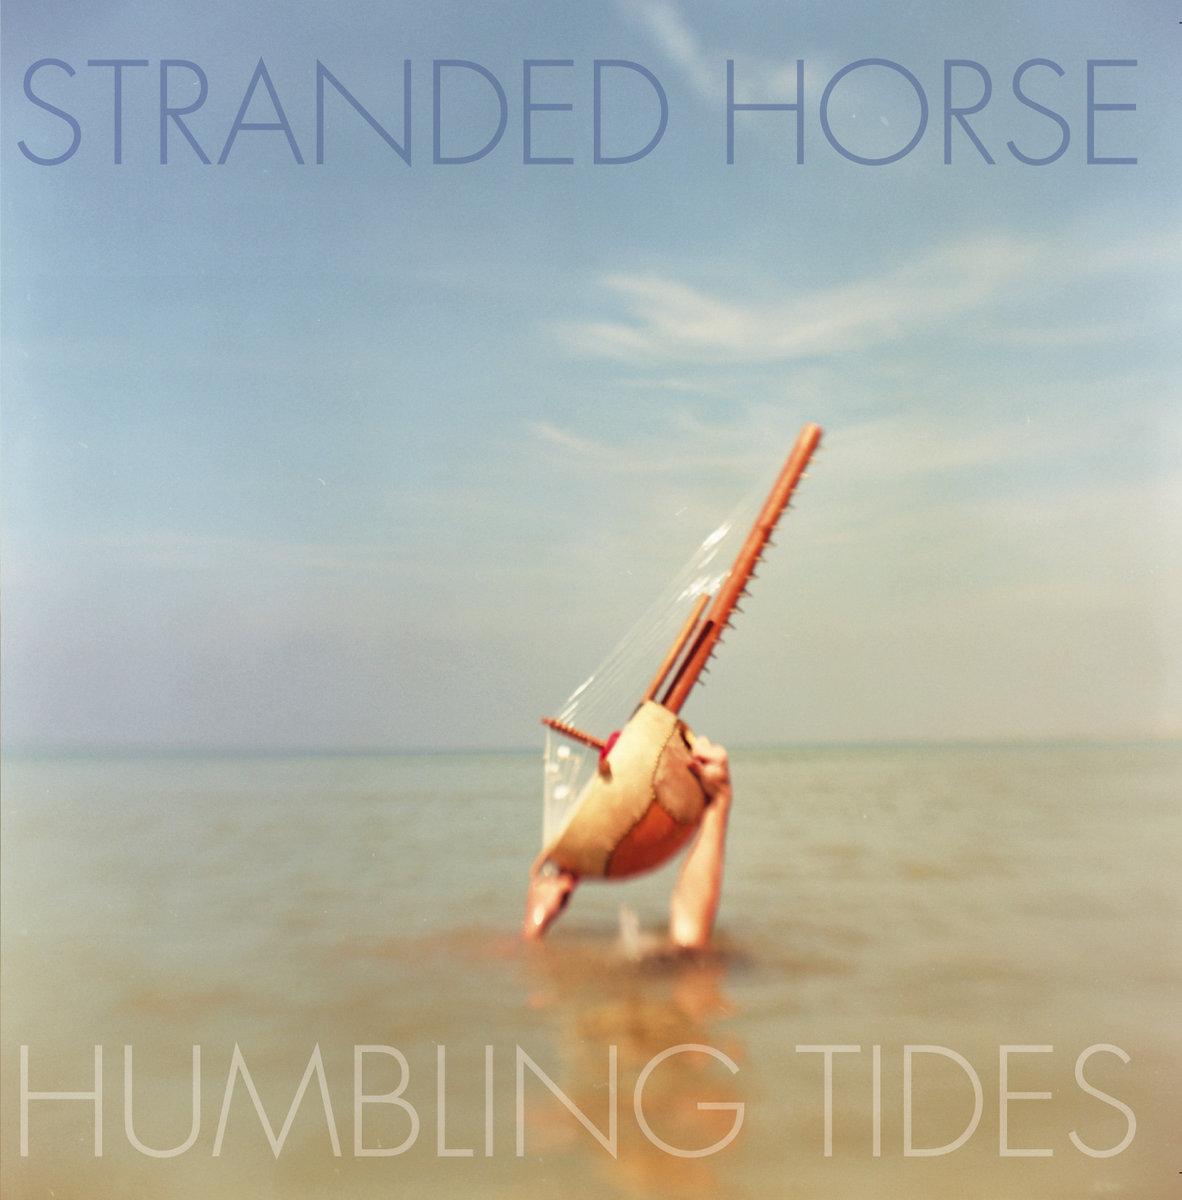 STRANDED HORSE - Humbling Tides, 2011